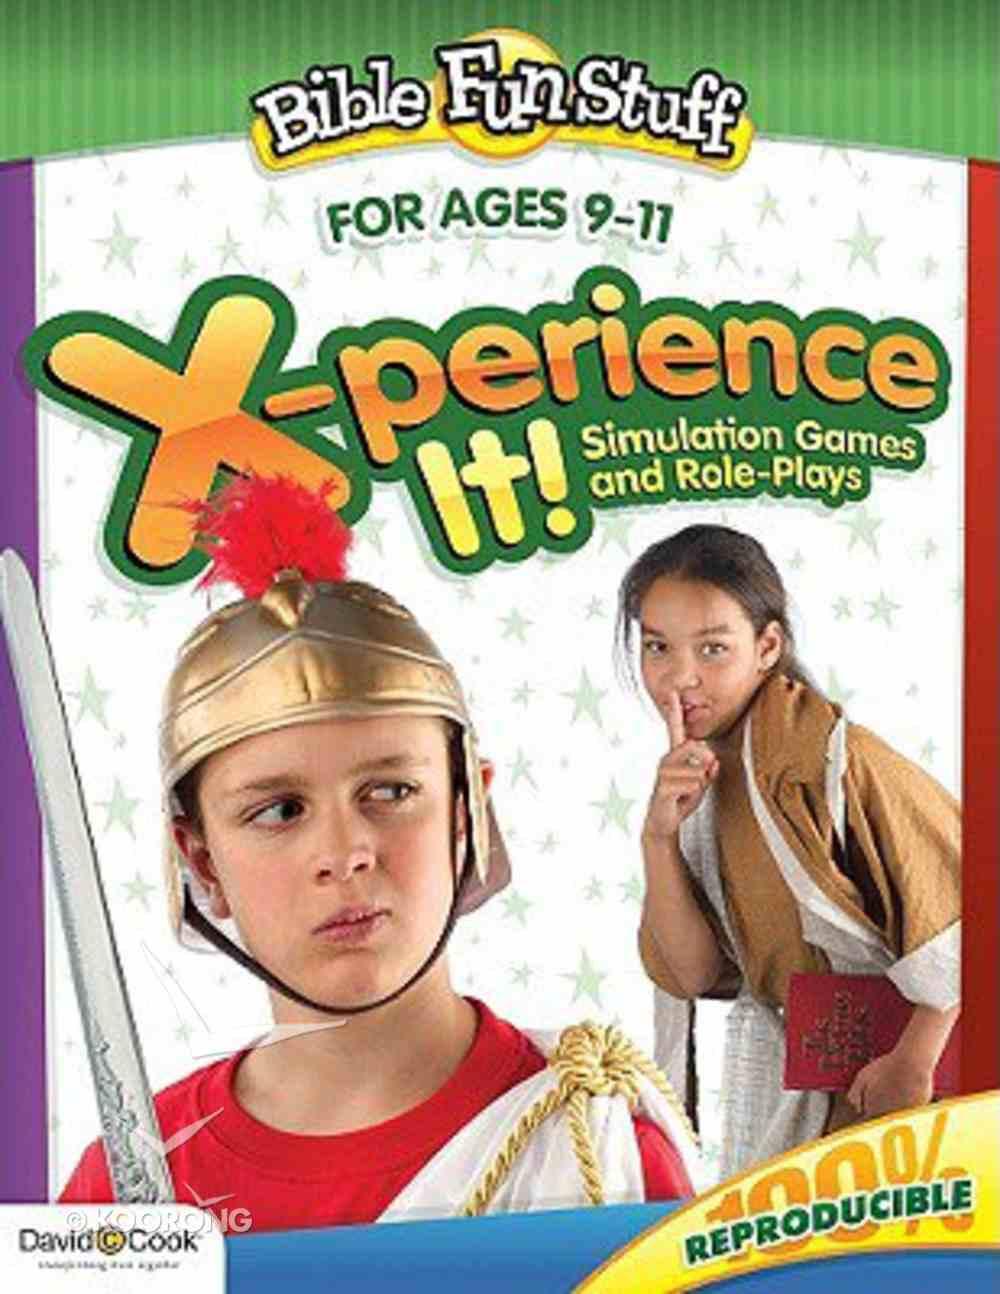 X-Perience It! (Reproducible) (Ages 9-11) (Bible Fun Stuff Series) Paperback